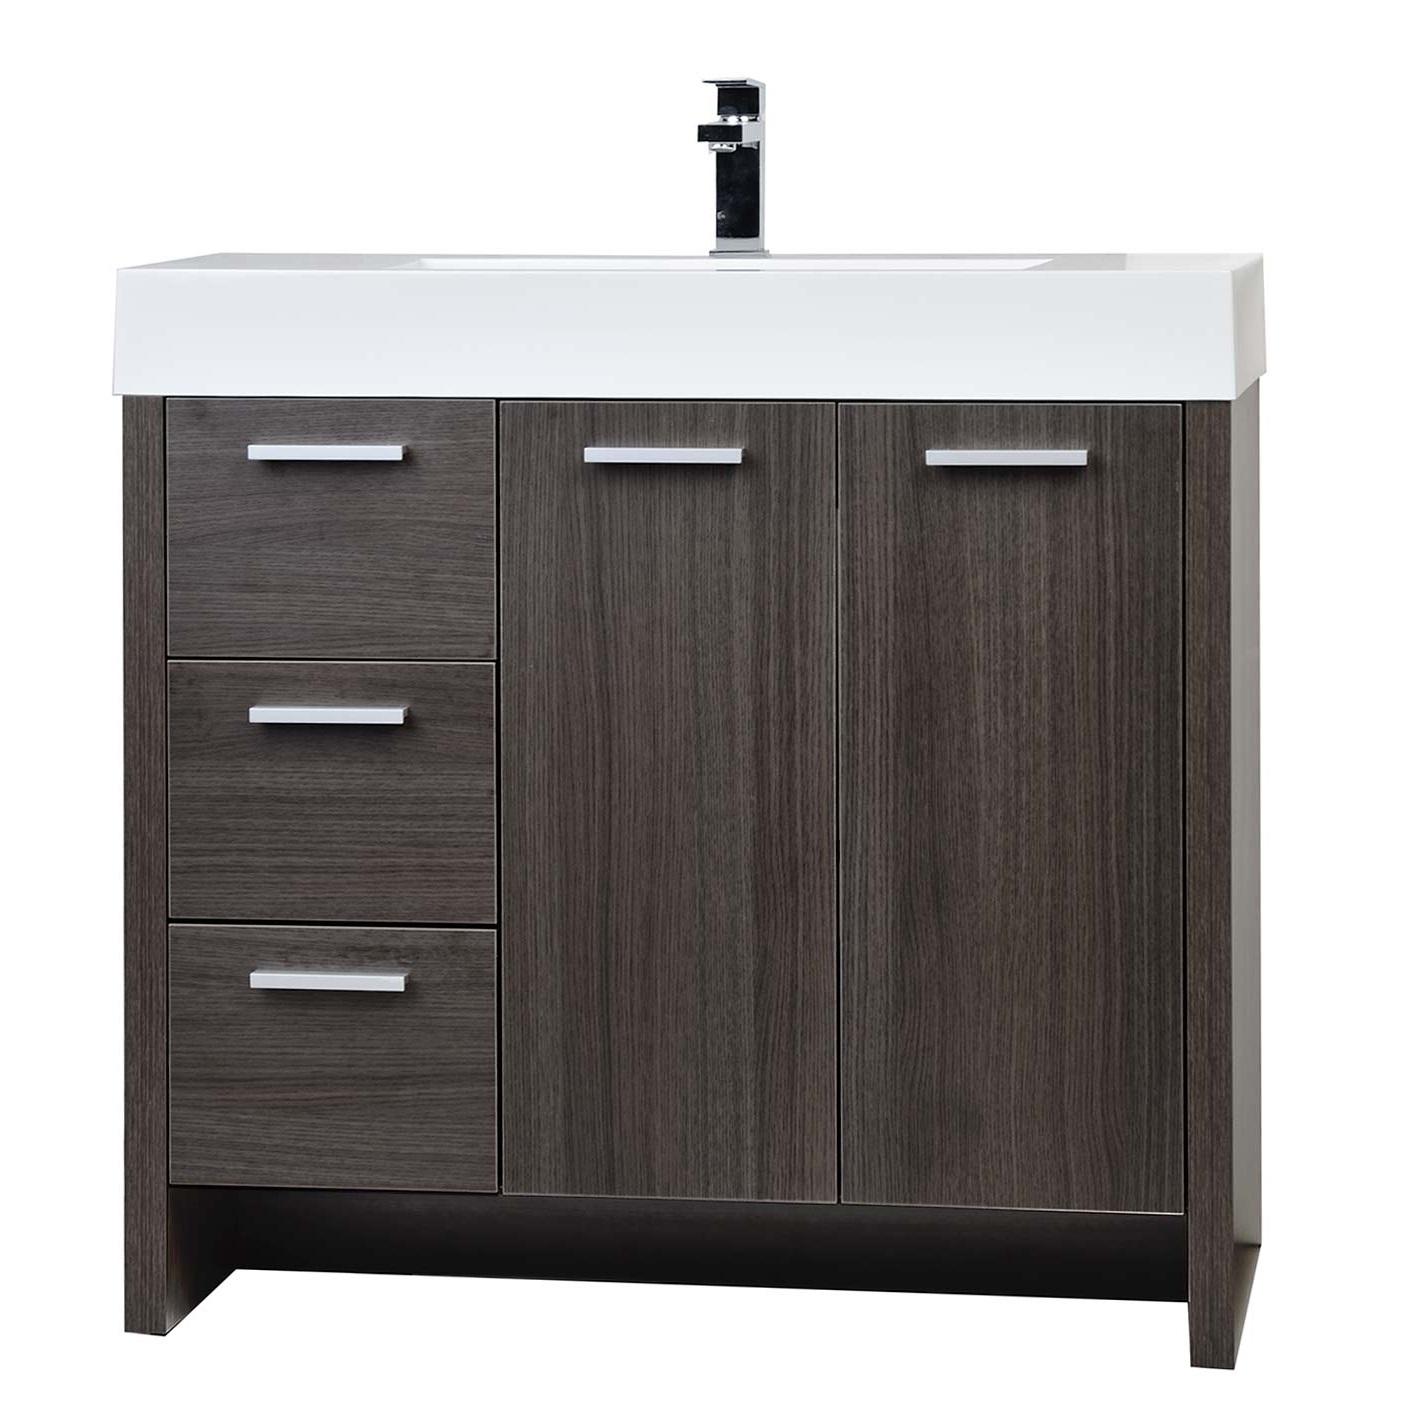 Buy 35 5 modern bathroom vanity grey oak finish tn ly900 for Find bathroom vanities